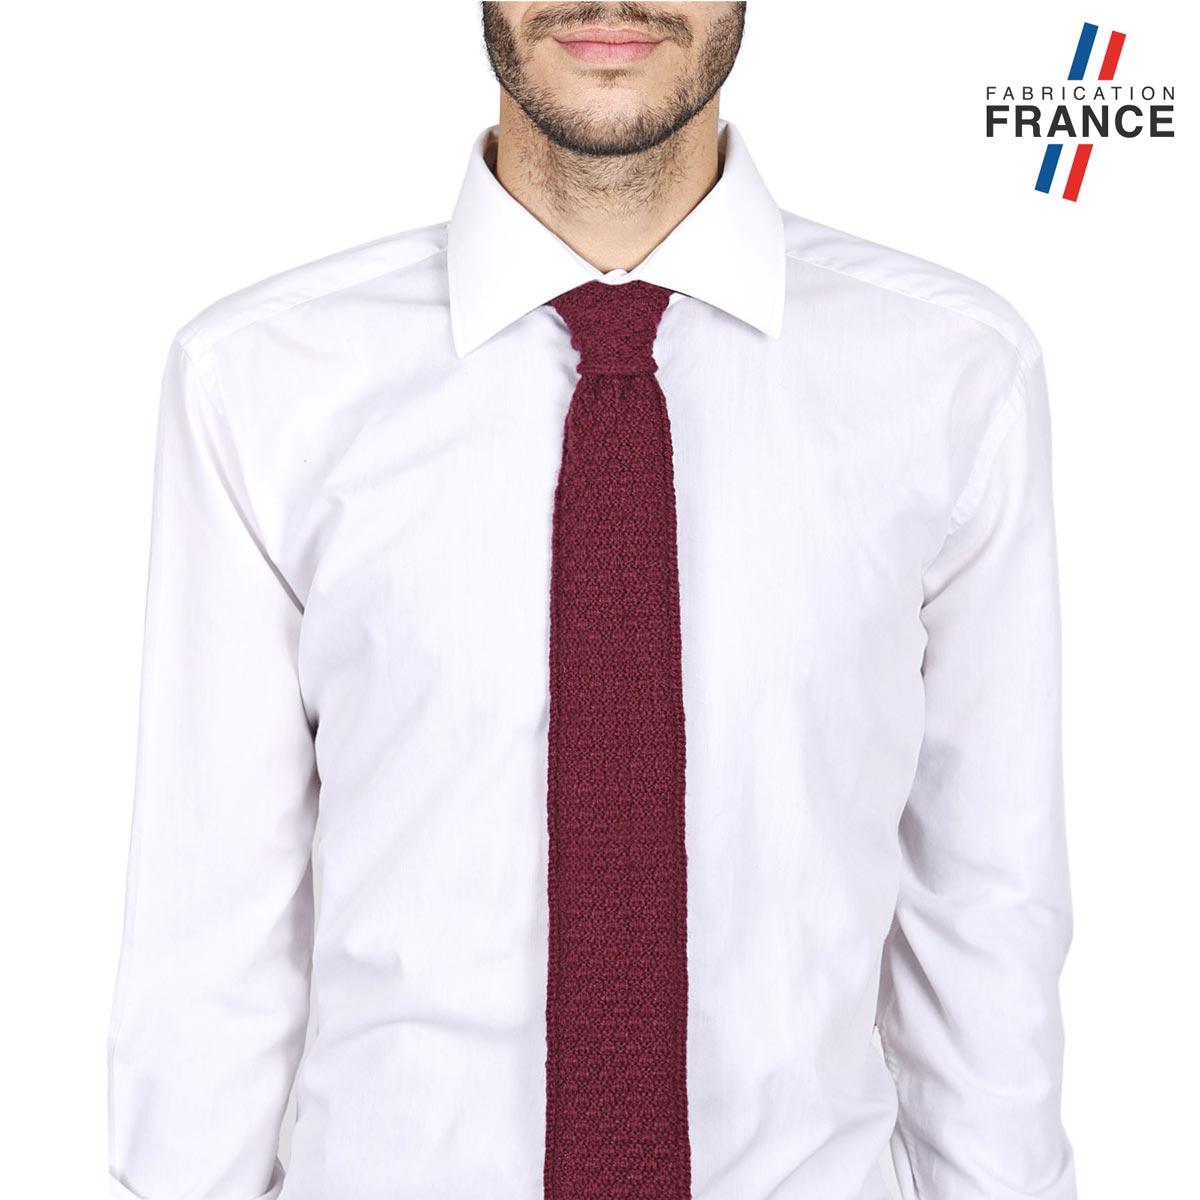 CV-00462_M12-1FR_Cravate-alpaga-laine-rouge